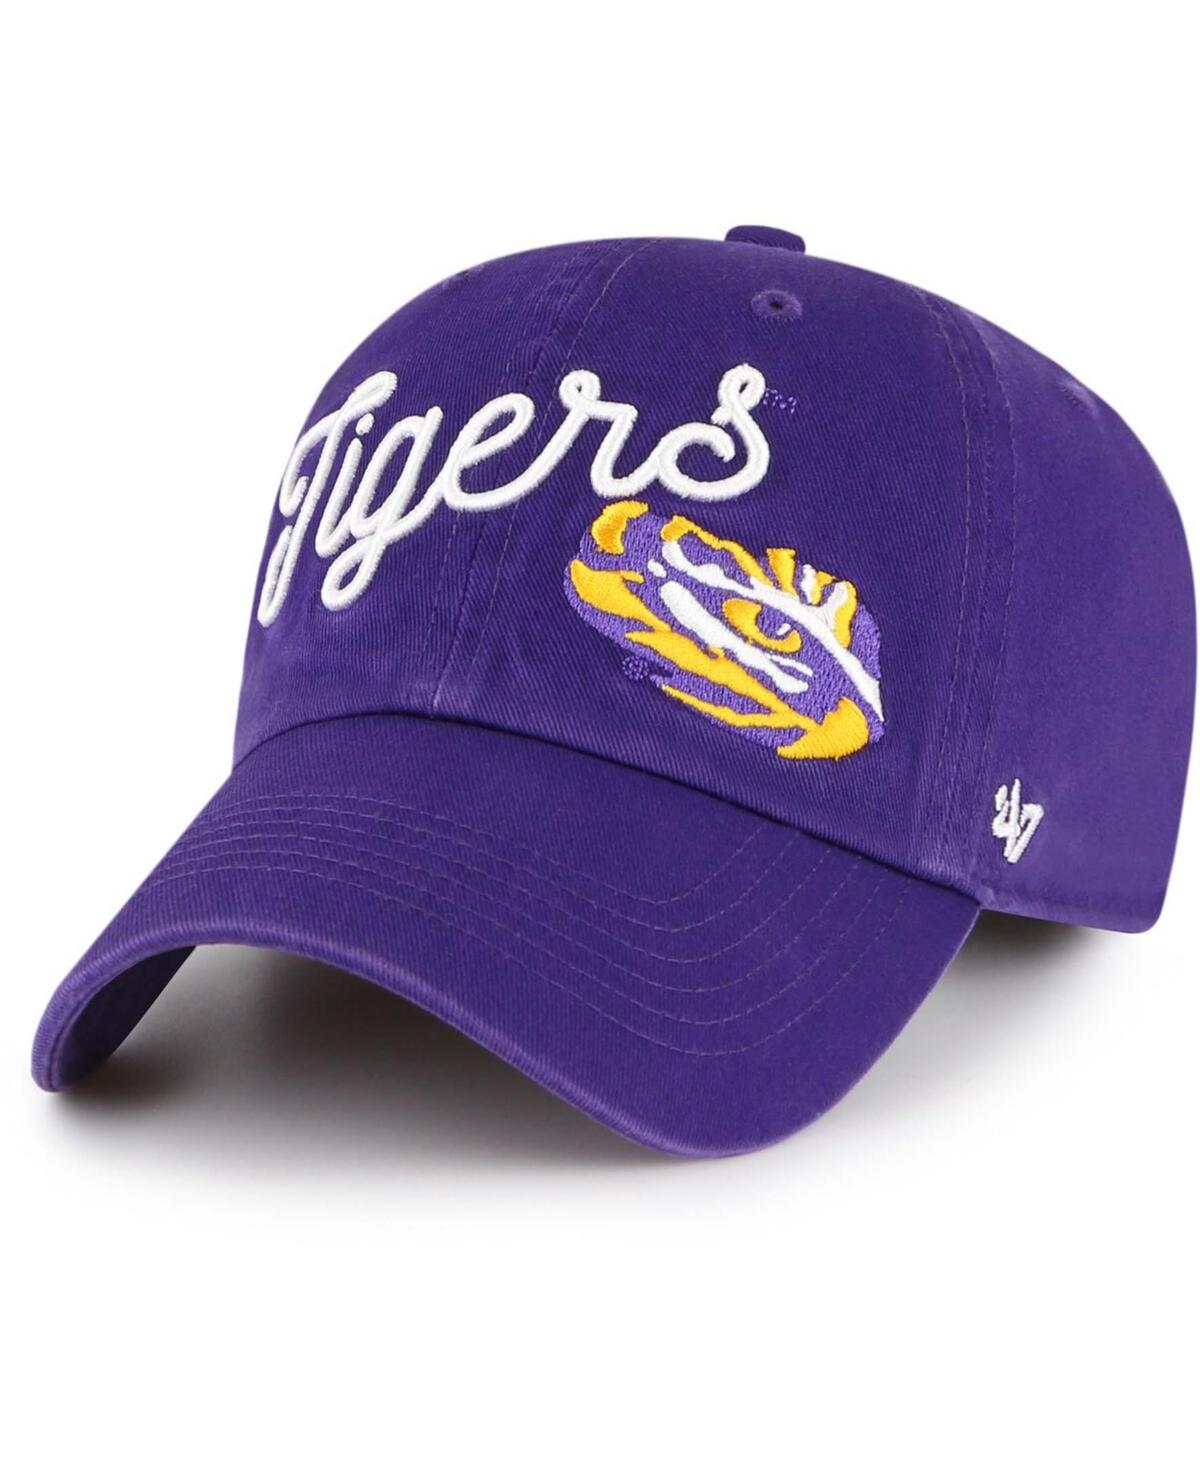 Womens Purple Lsu Tigers Millie Clean Up Adjustable Hat